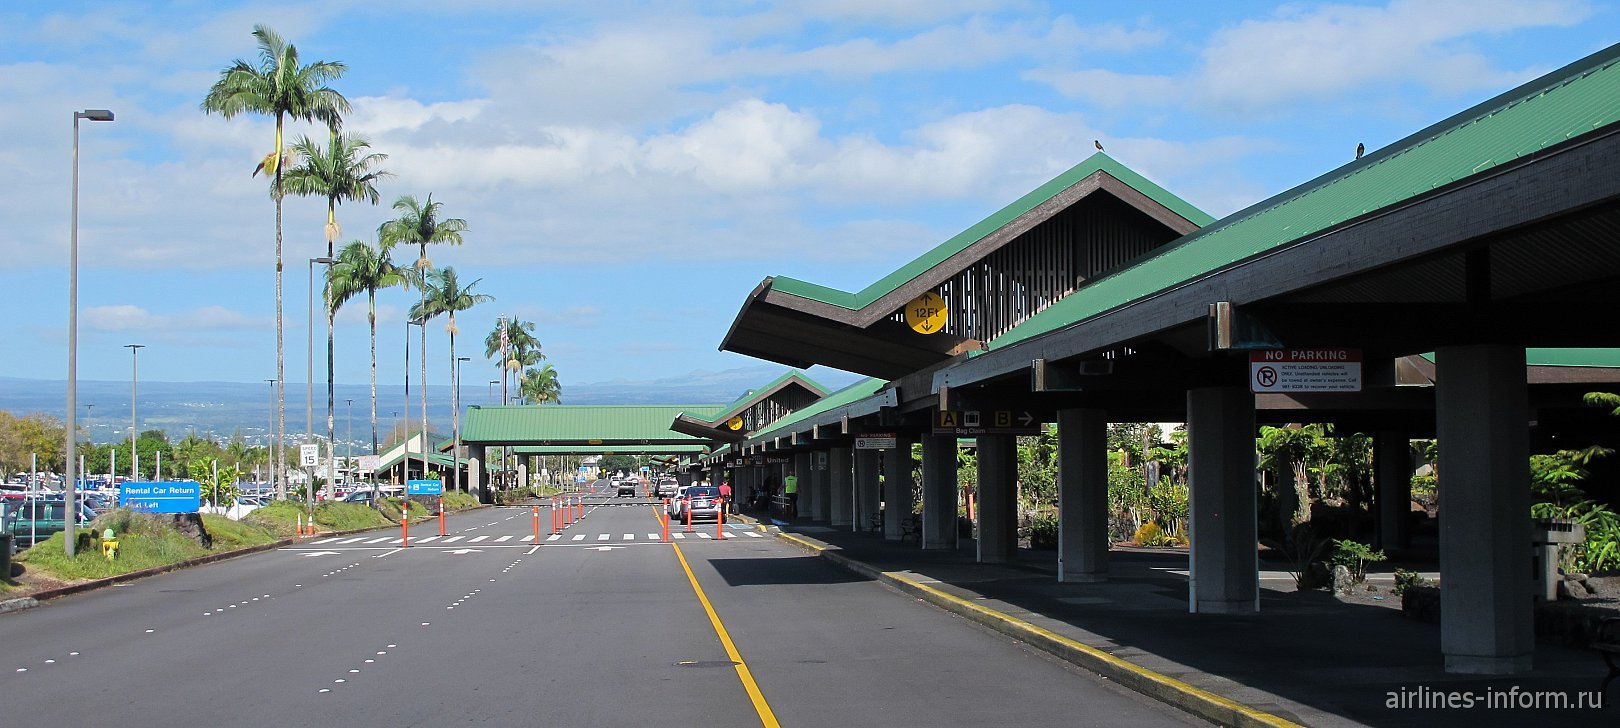 Пассажирский терминал аэропорта Хило